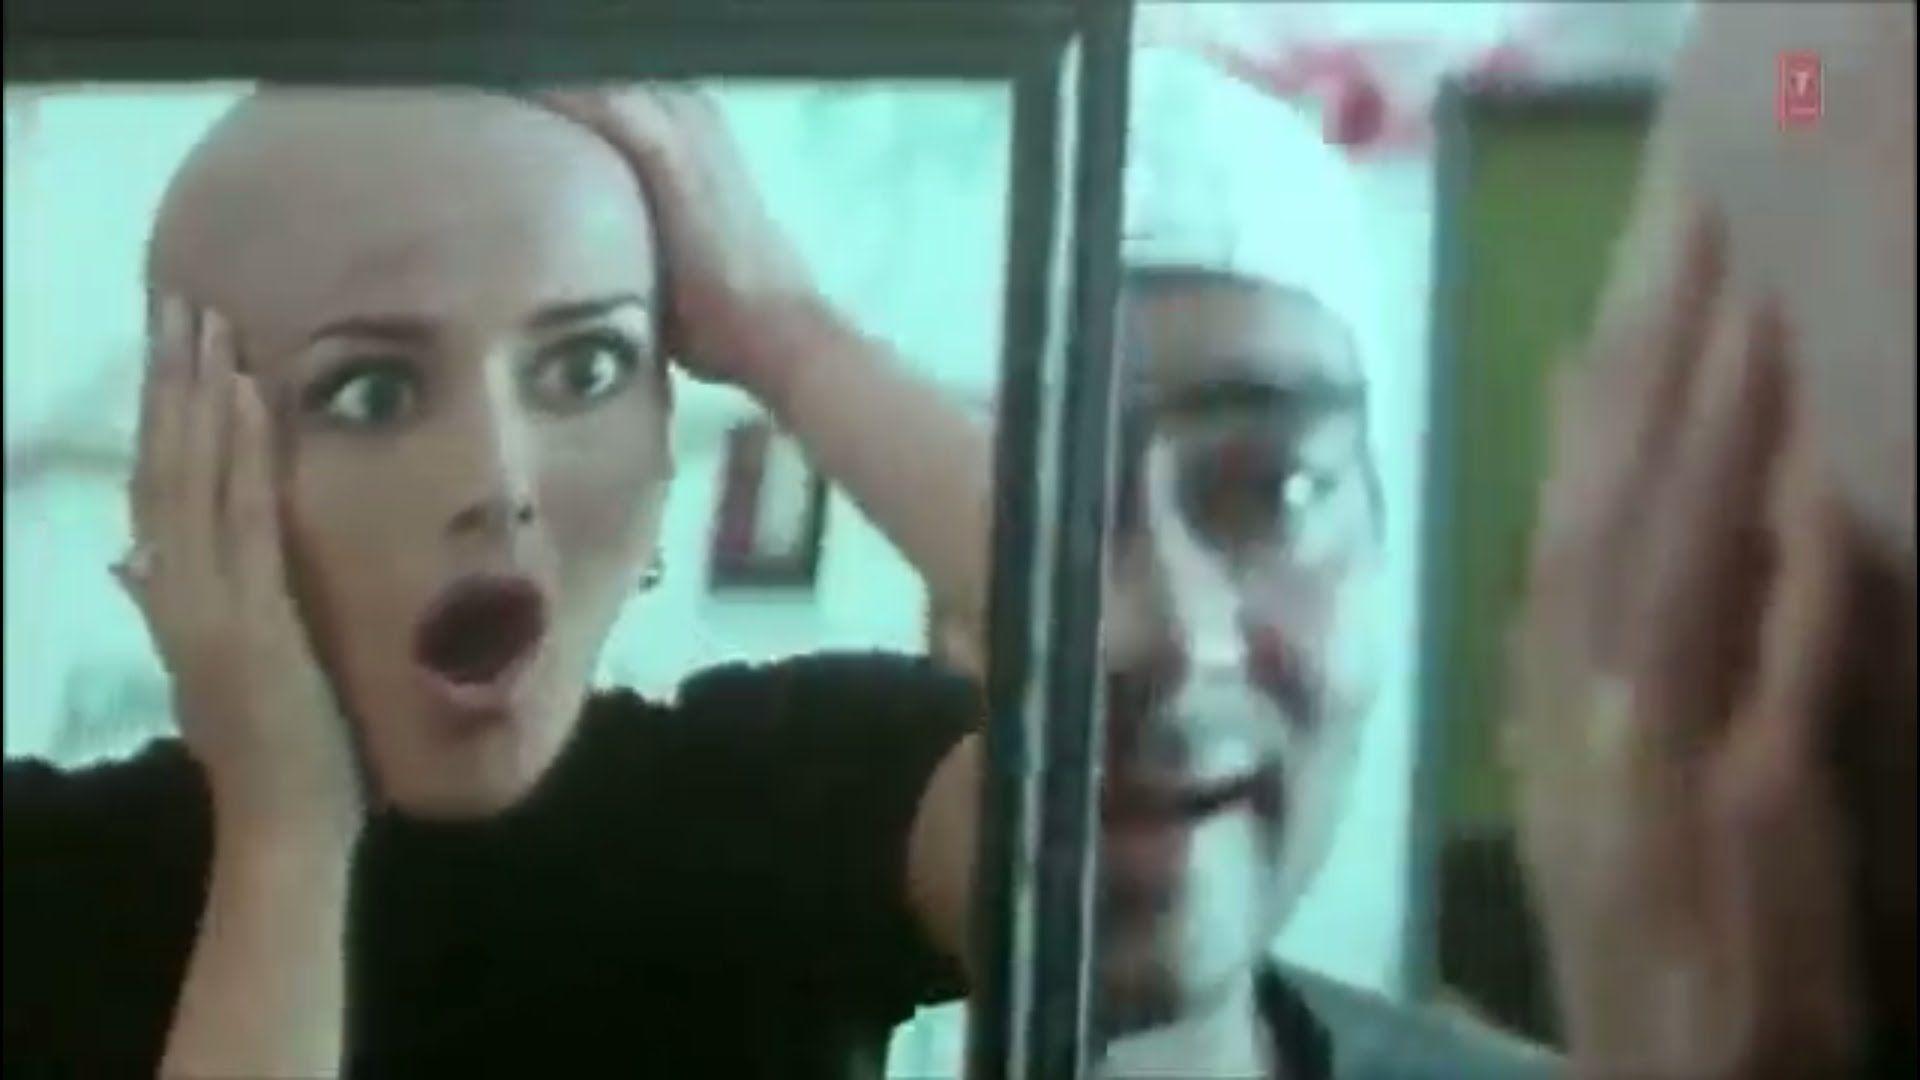 Sonali Bendre Bald Look In Indian Movie Major Saab Headshave Look